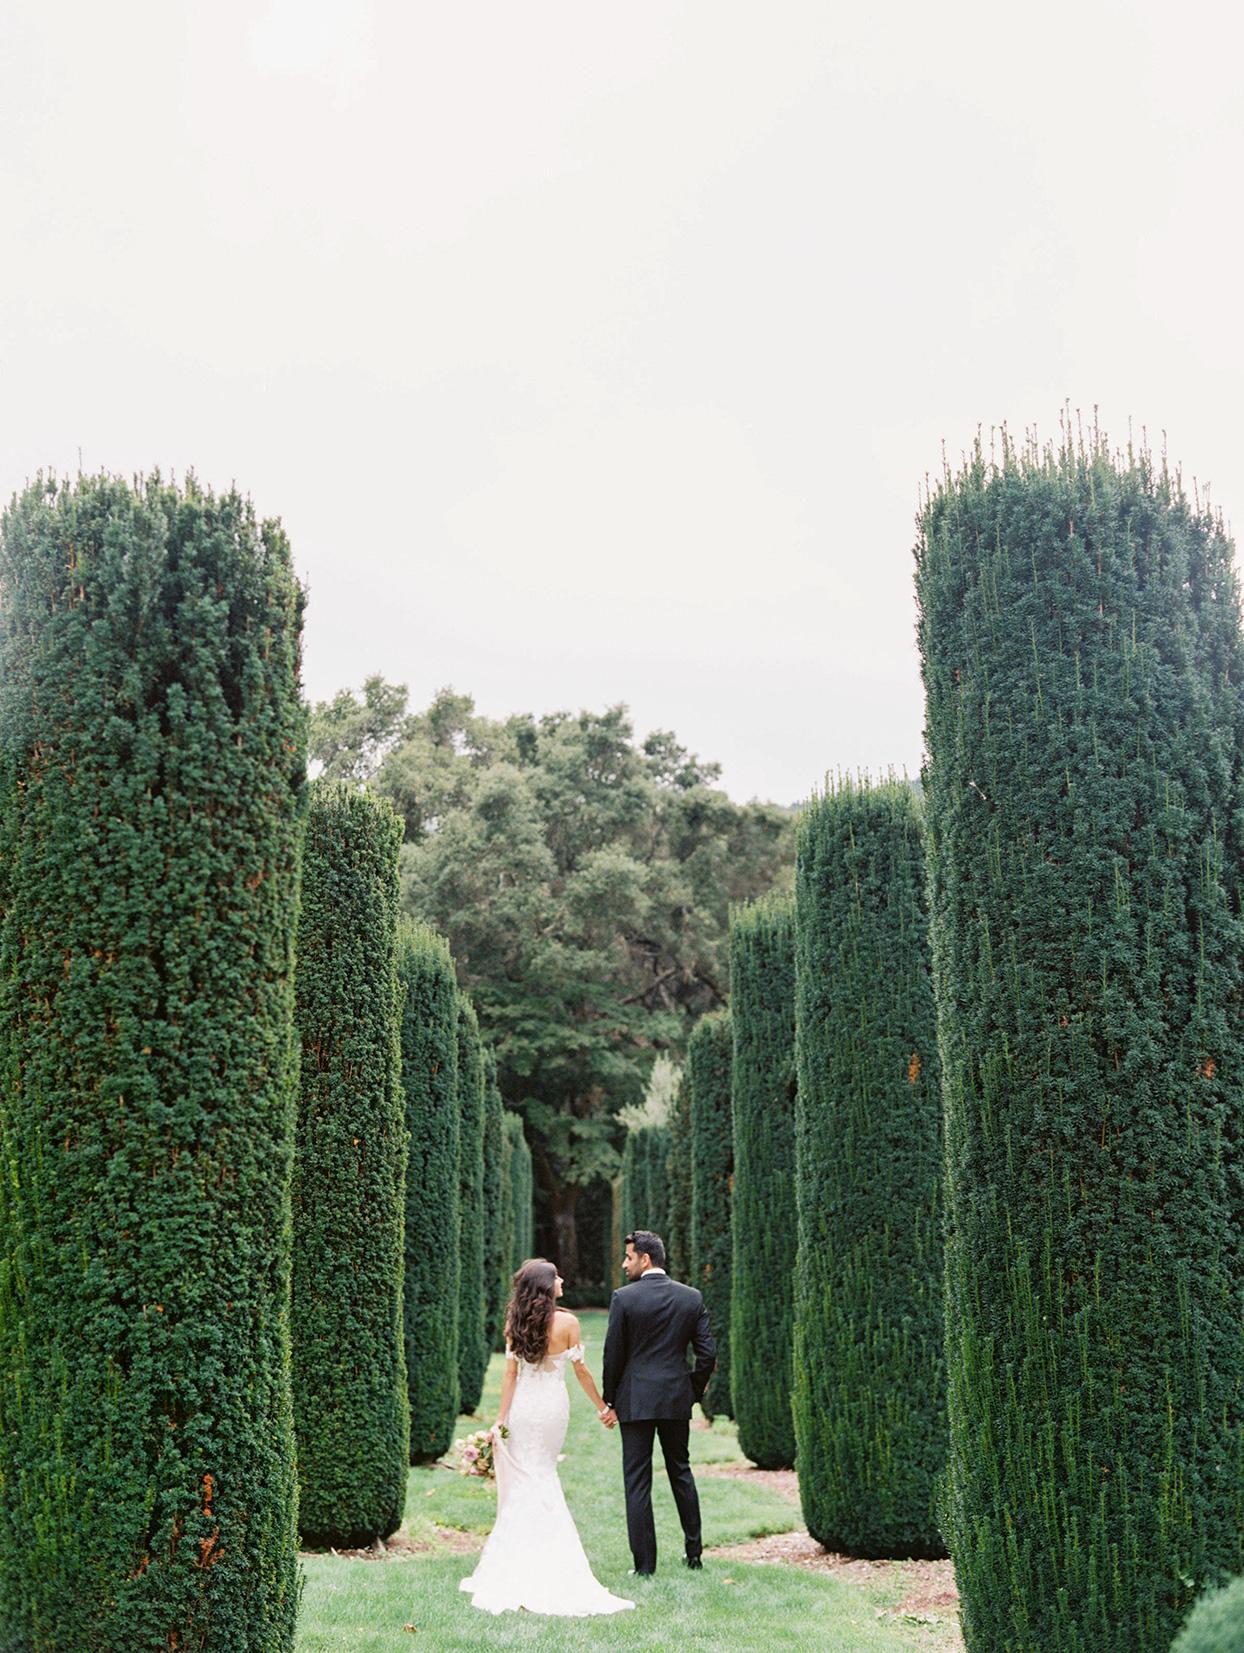 yalda anusha wedding couple walking through tall garden trees